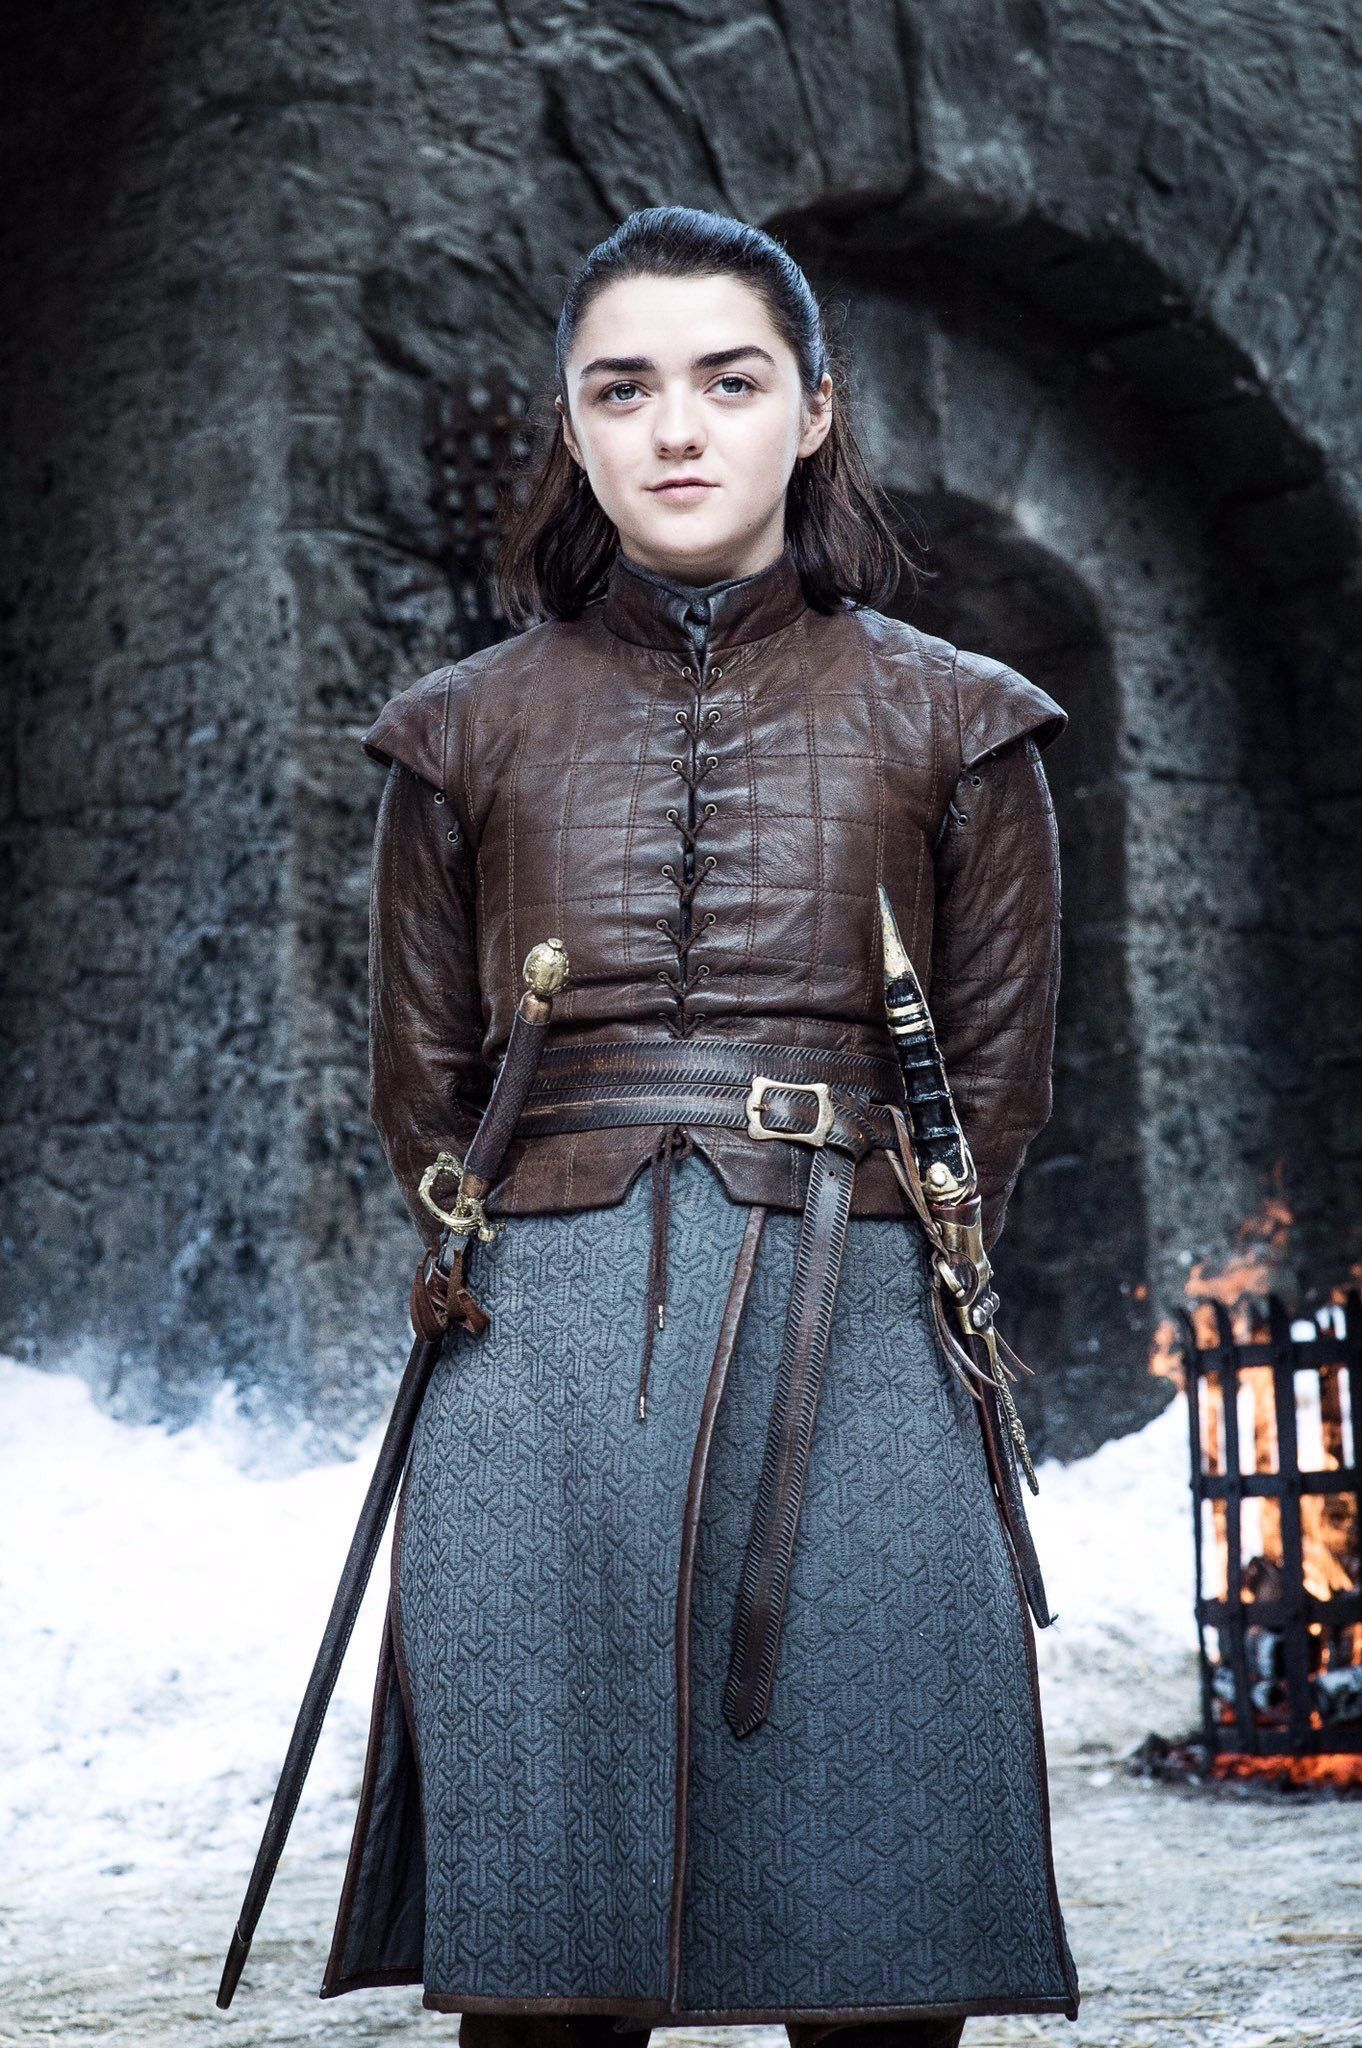 Arya Stark S7 Arya Stark Season 7 Arya Stark Game Of Thrones Arya Starks game of thrones season 7